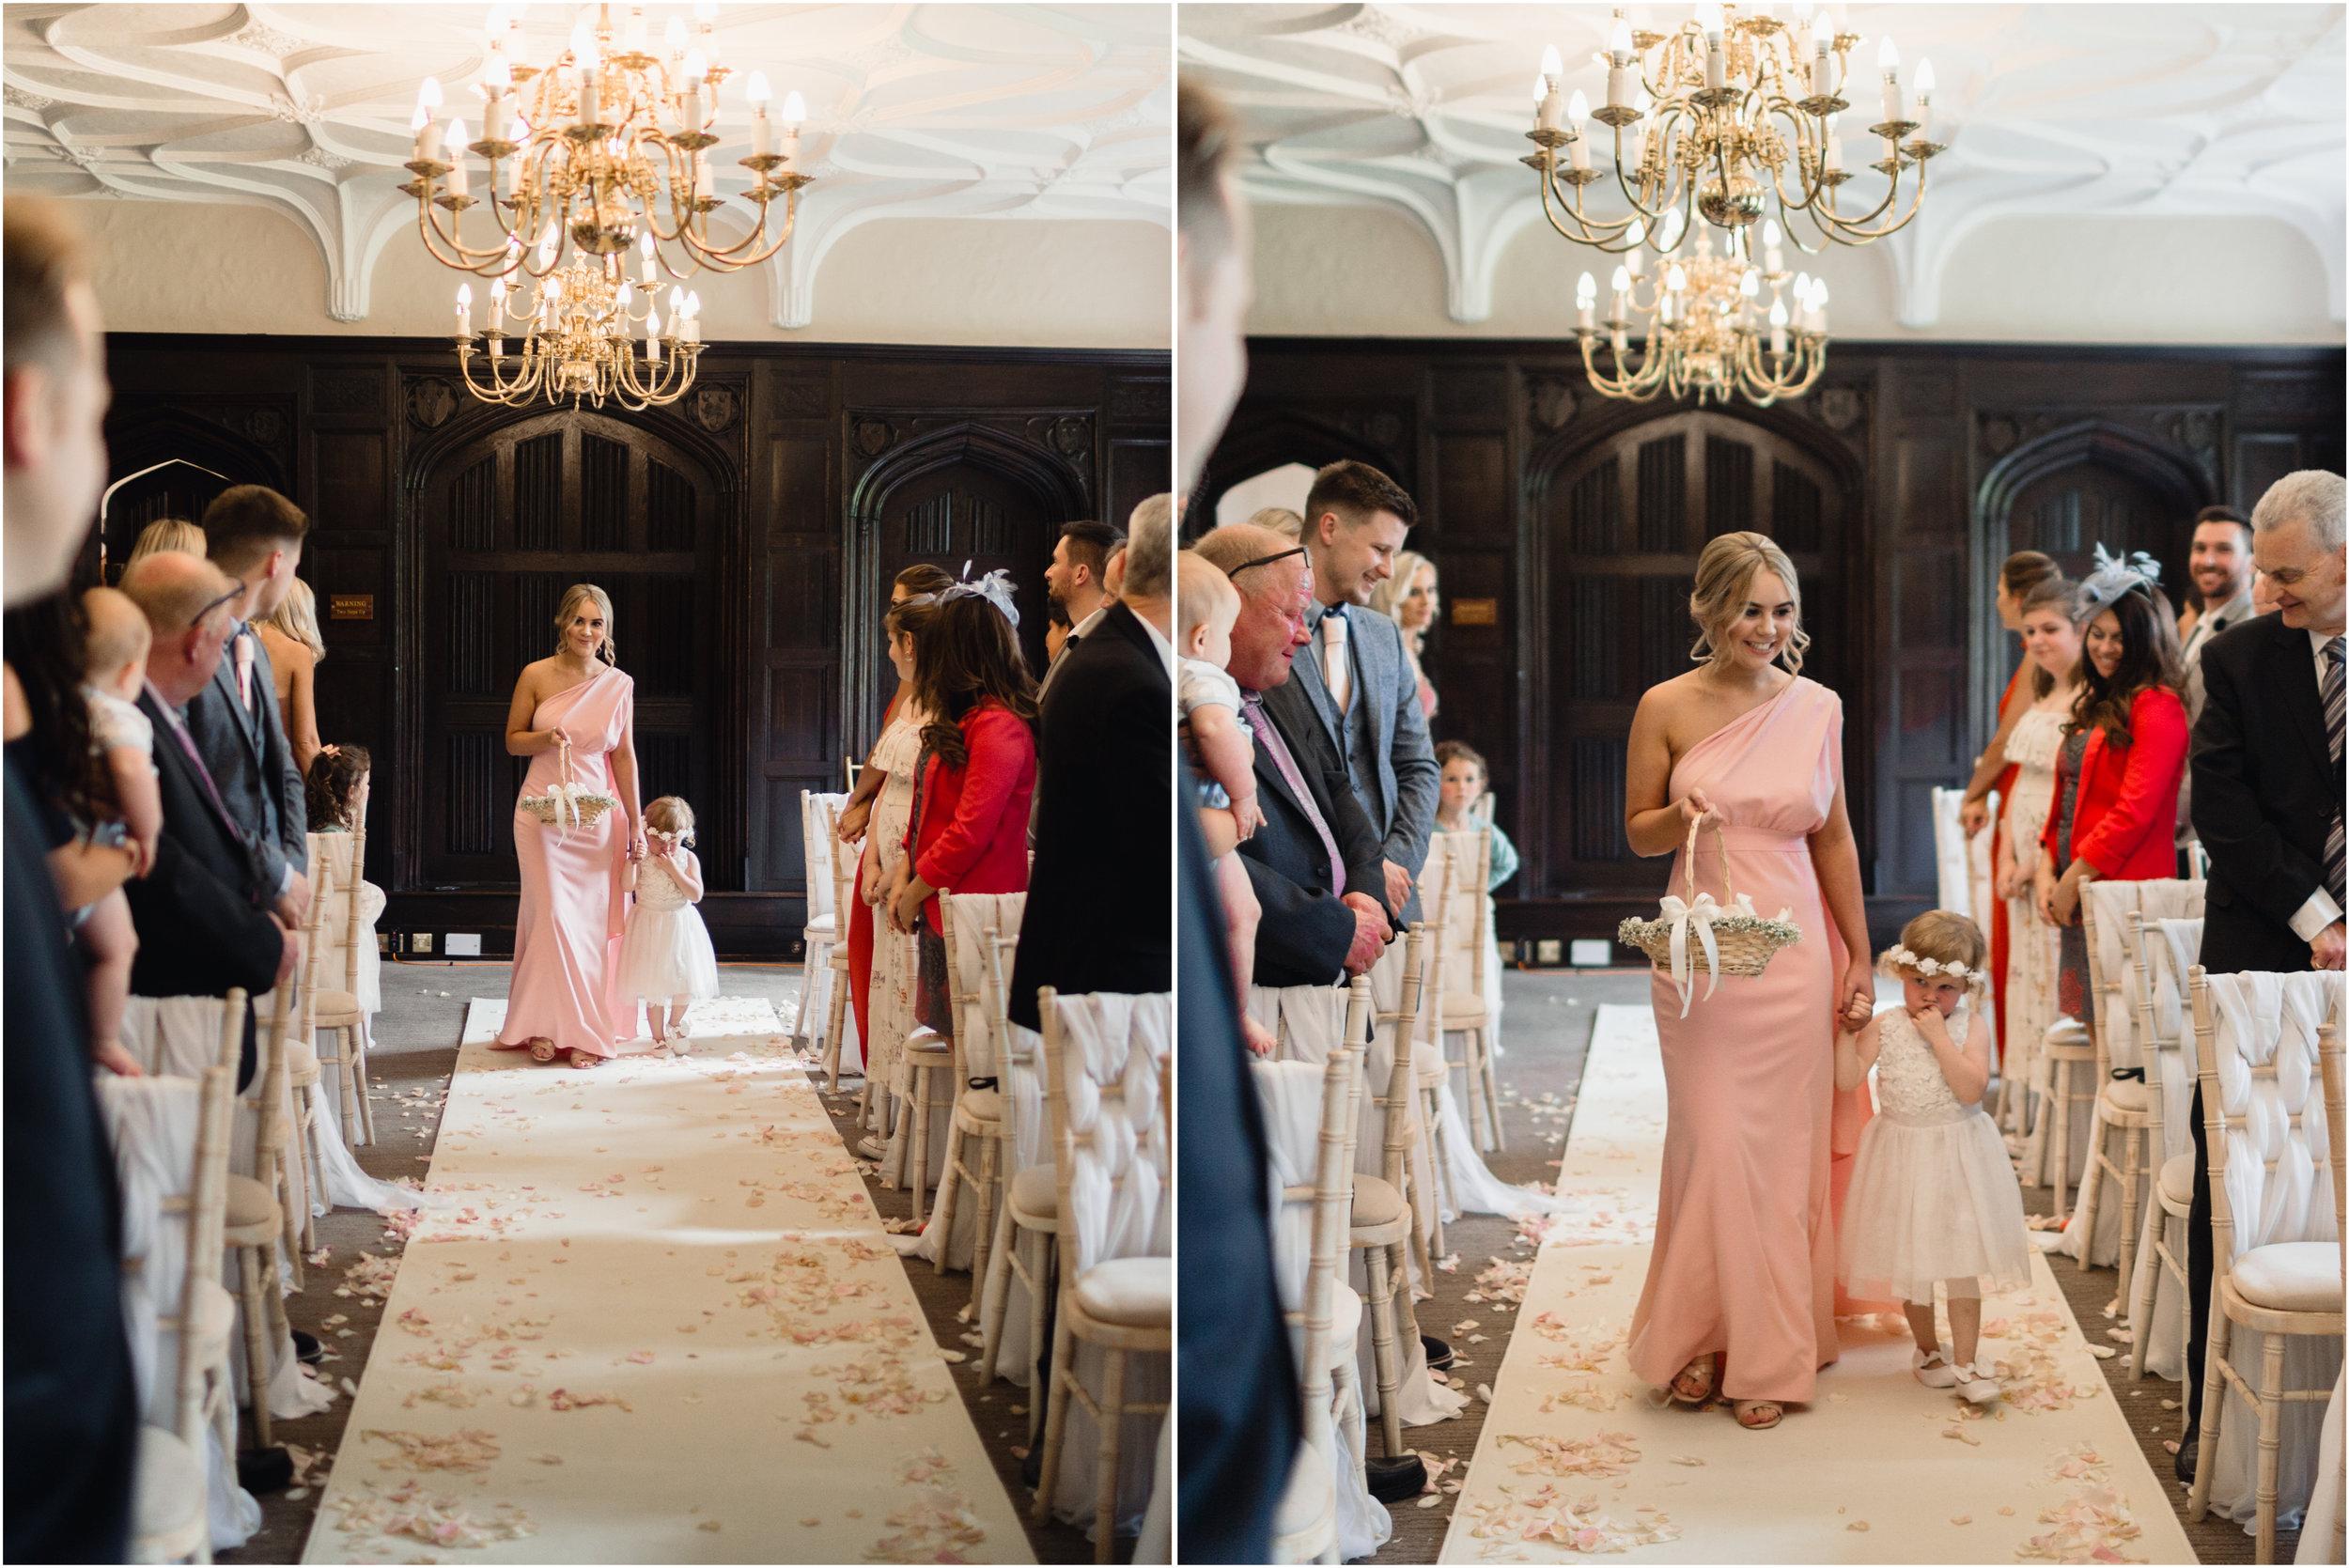 Rebecca Searle Wedding Photography Surrey London Luxury 37.jpg